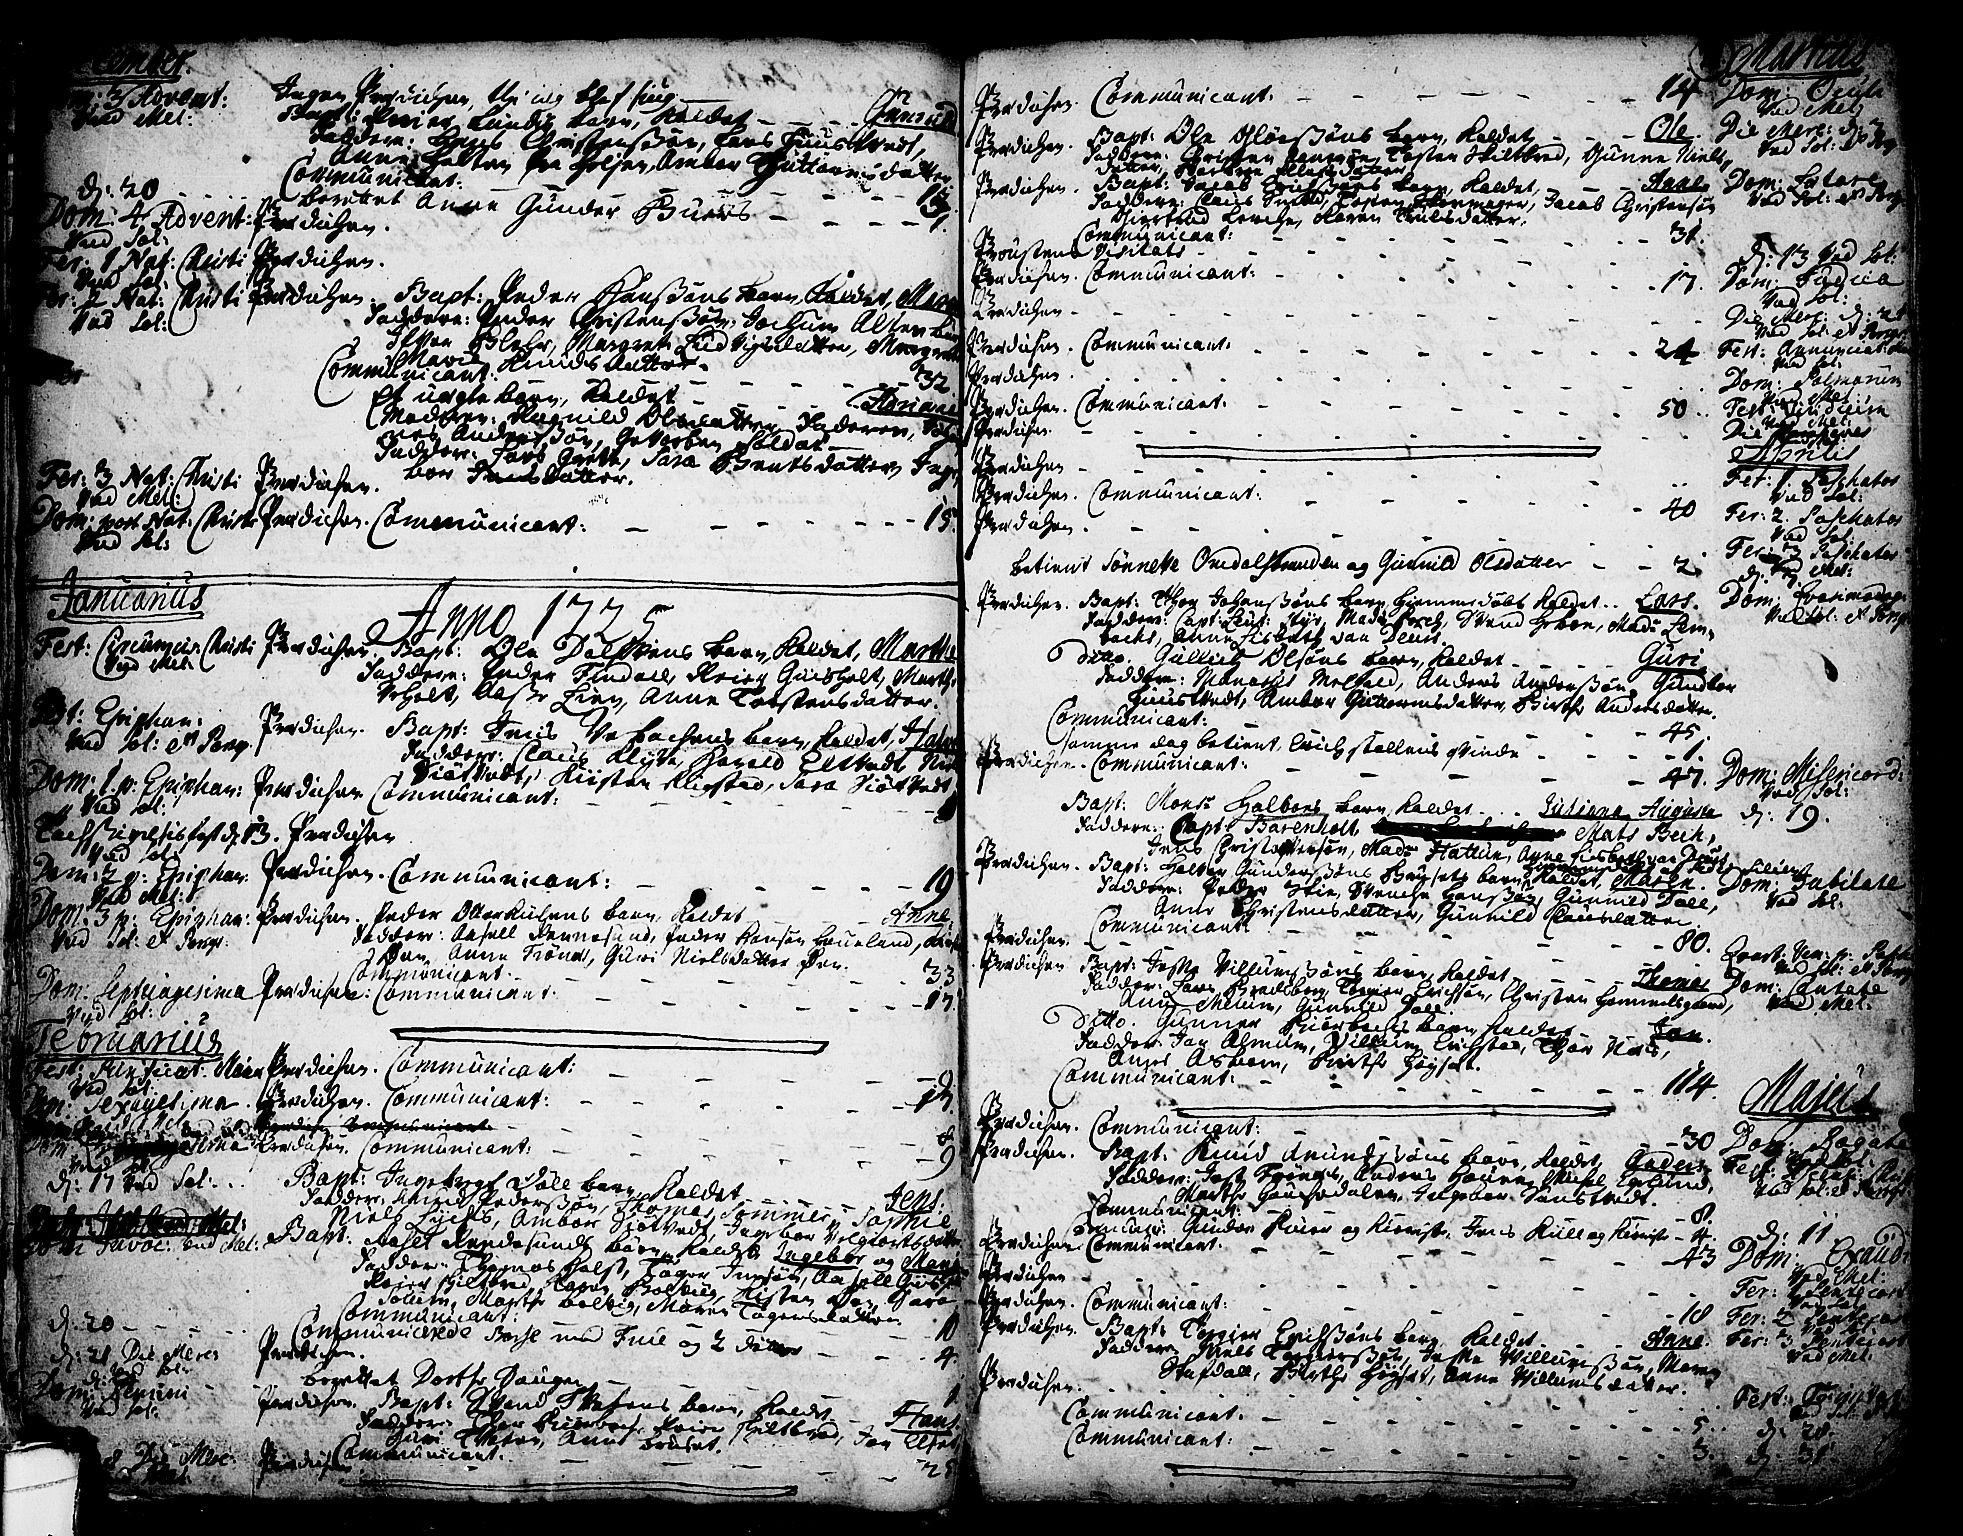 SAKO, Solum kirkebøker, F/Fa/L0002: Ministerialbok nr. I 2, 1713-1761, s. 29